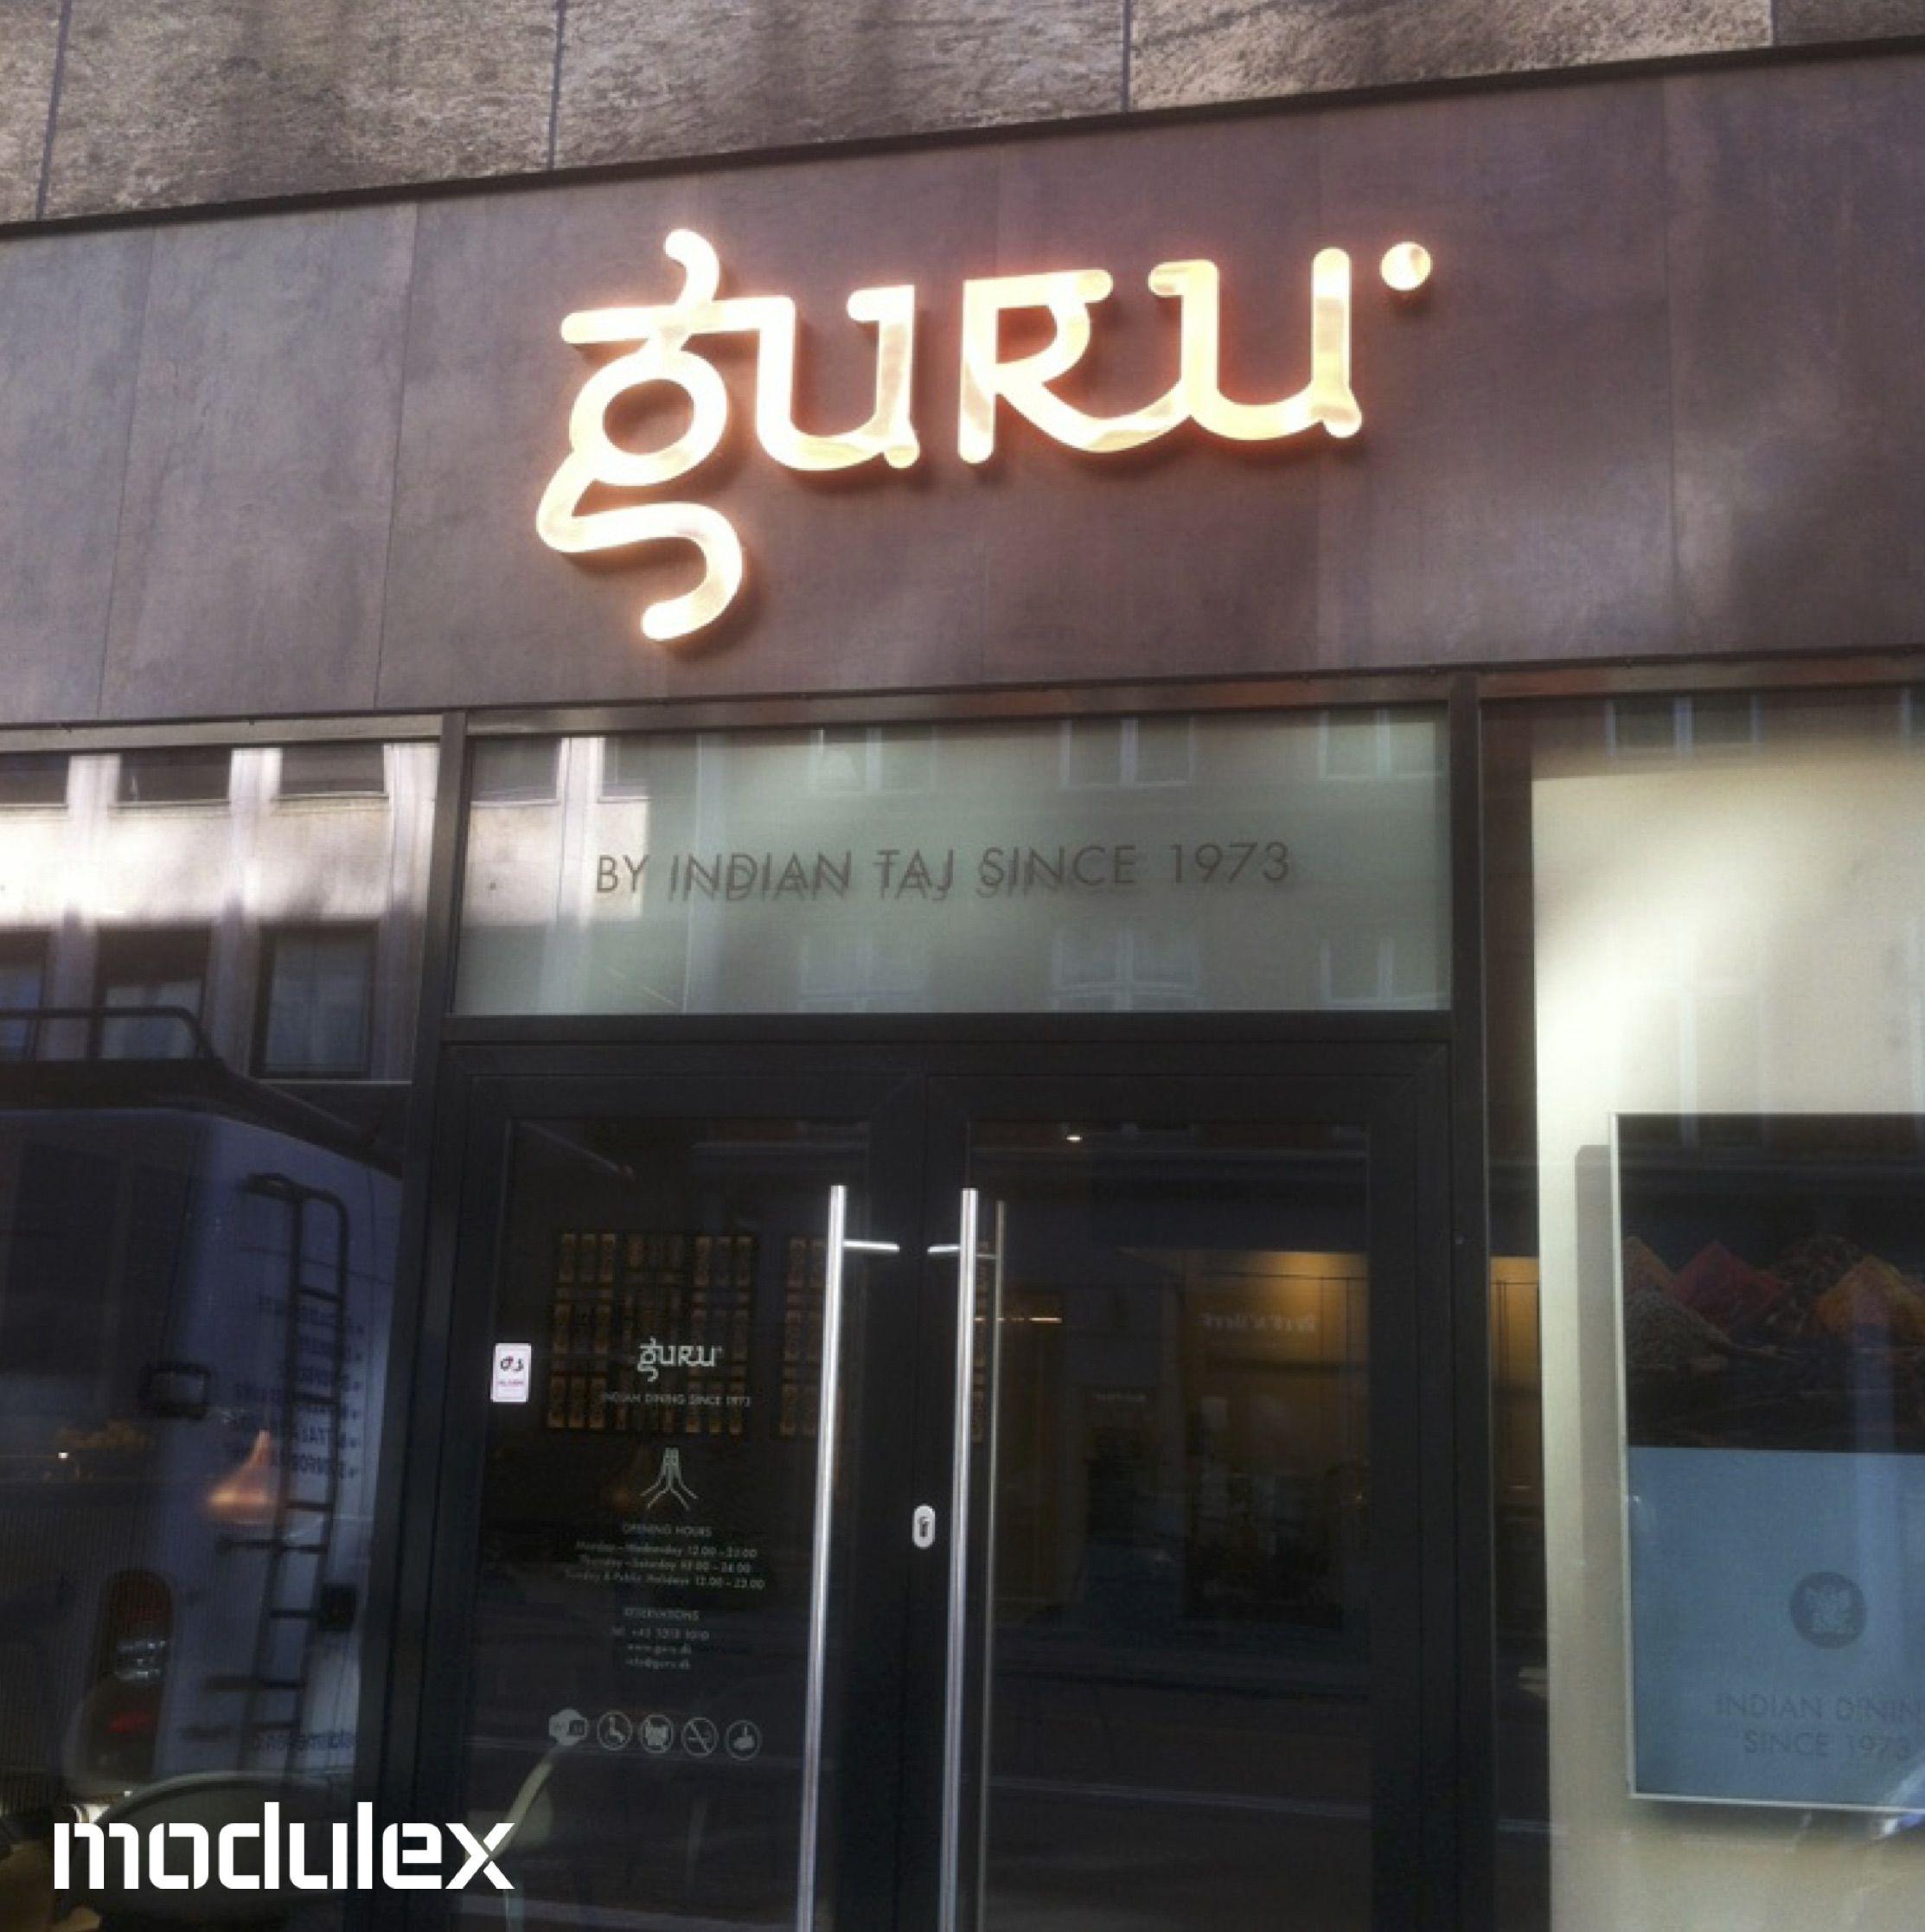 Indian Restaurant Signage